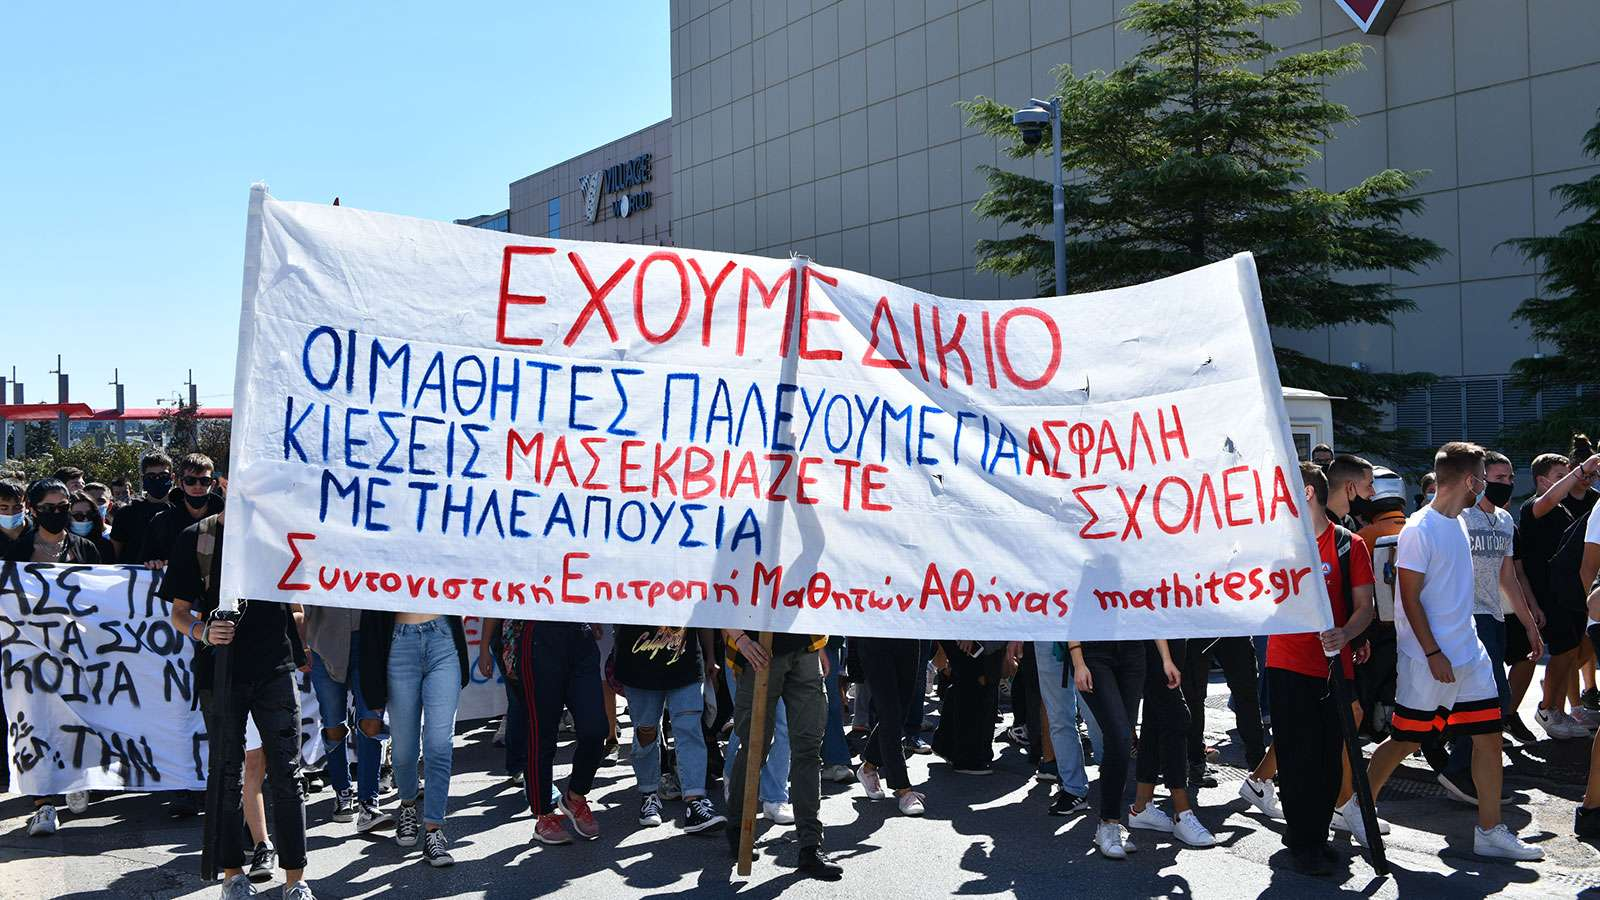 mathites kinitopoiisi Η κυβέρνηση έπνιξε με χημικά τη διαδήλωση 6